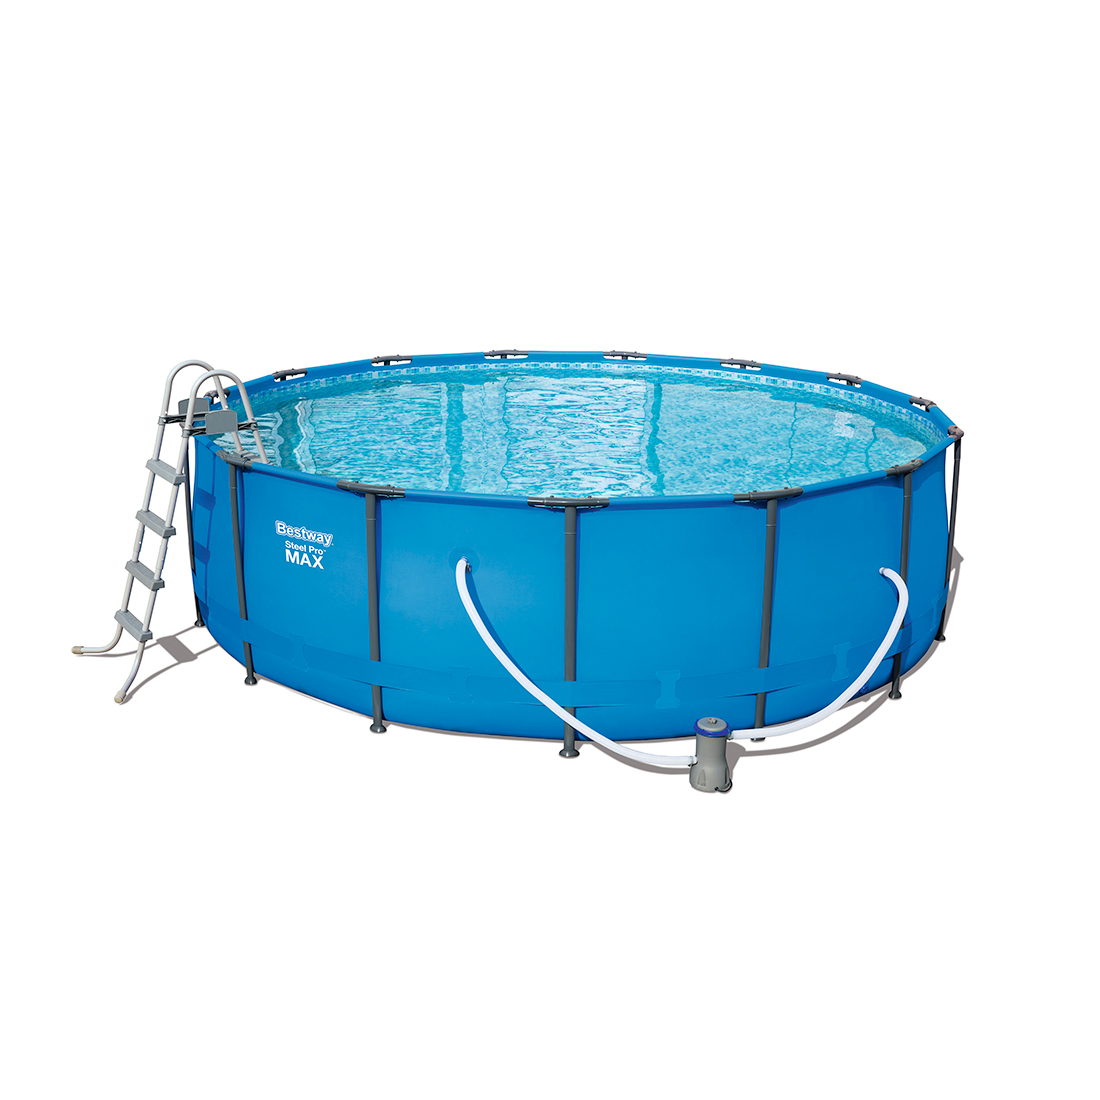 Каркасный бассейн Bestway 56438 (синий)